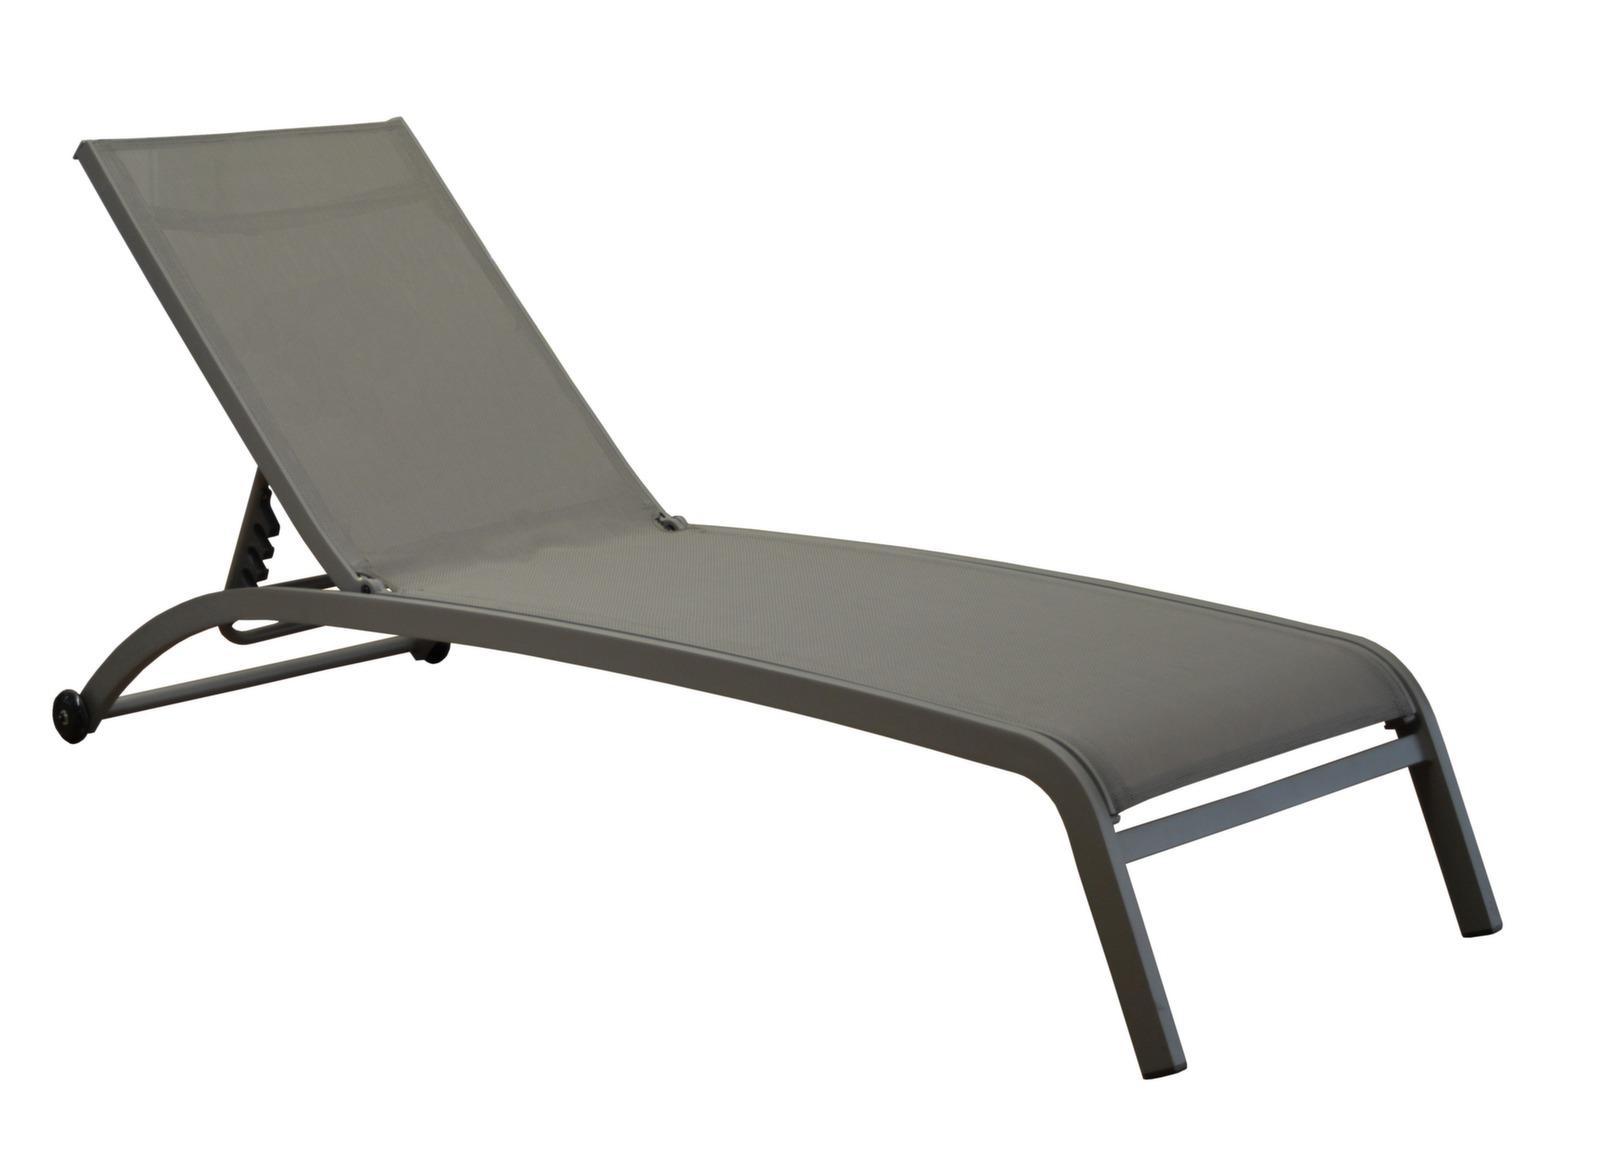 bain de soleil flower avec dossier r glable proloisirs. Black Bedroom Furniture Sets. Home Design Ideas